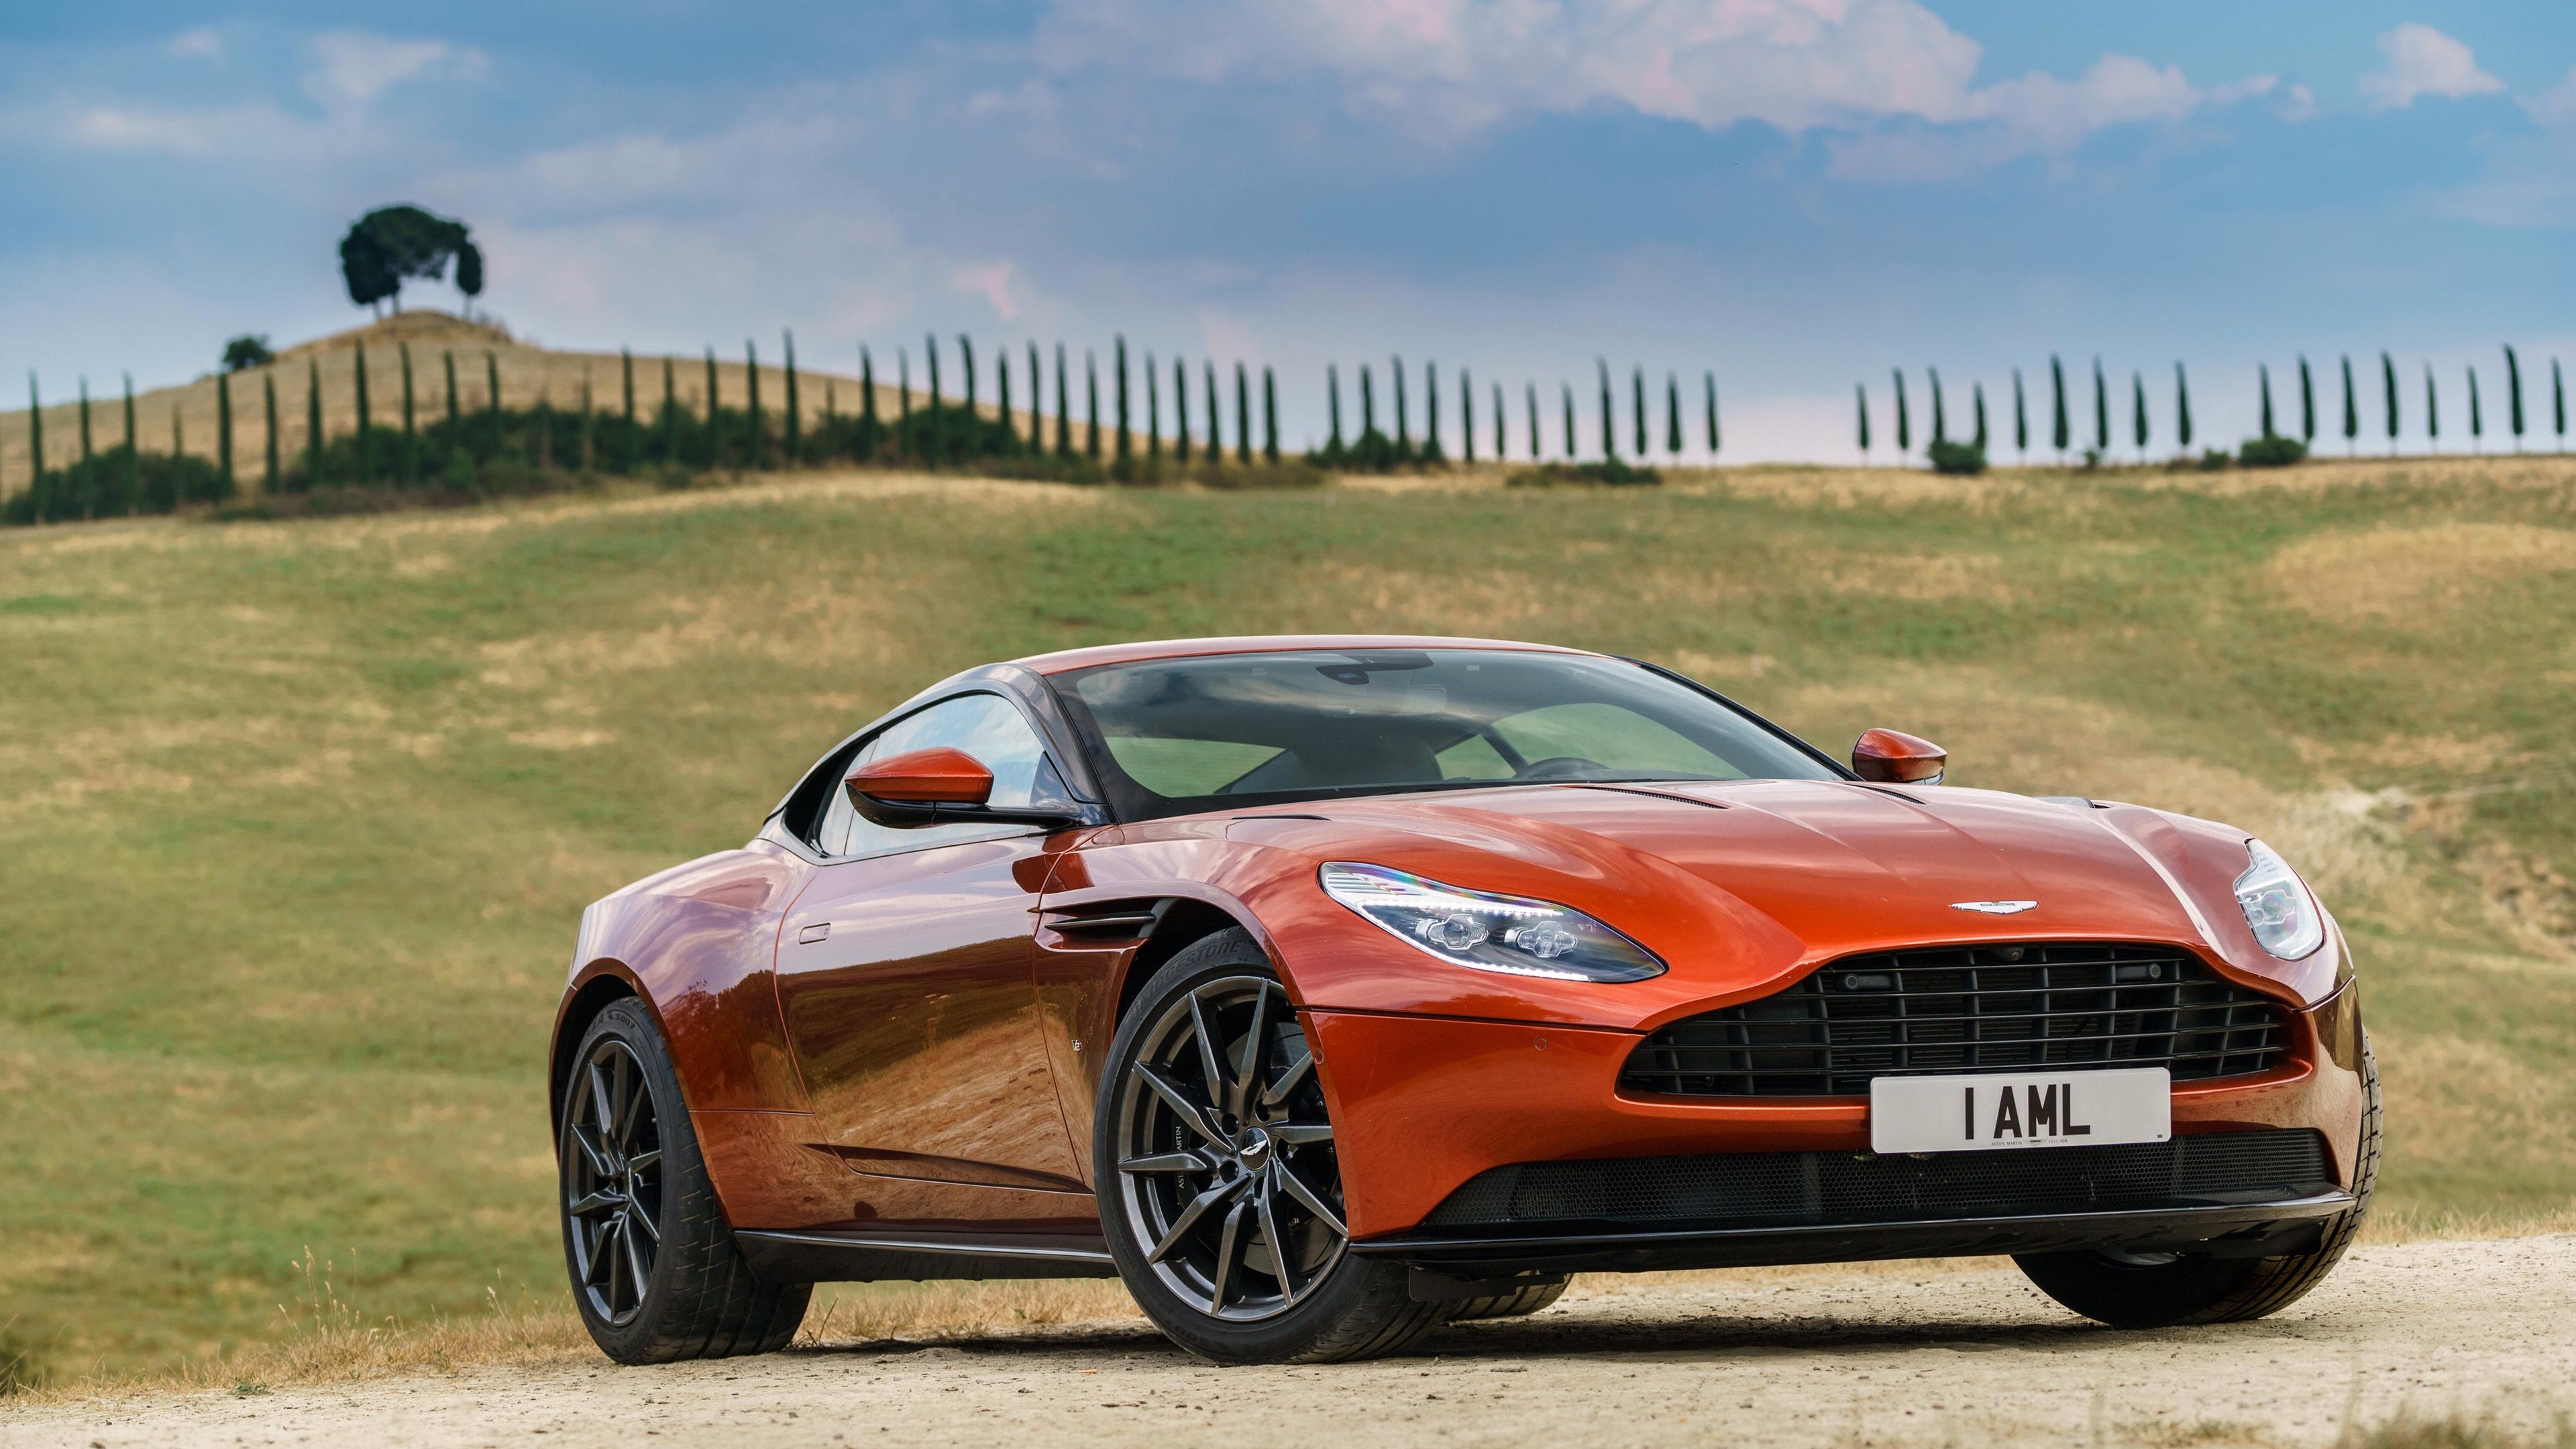 Zendha Aston Martin Wallpaper 4k